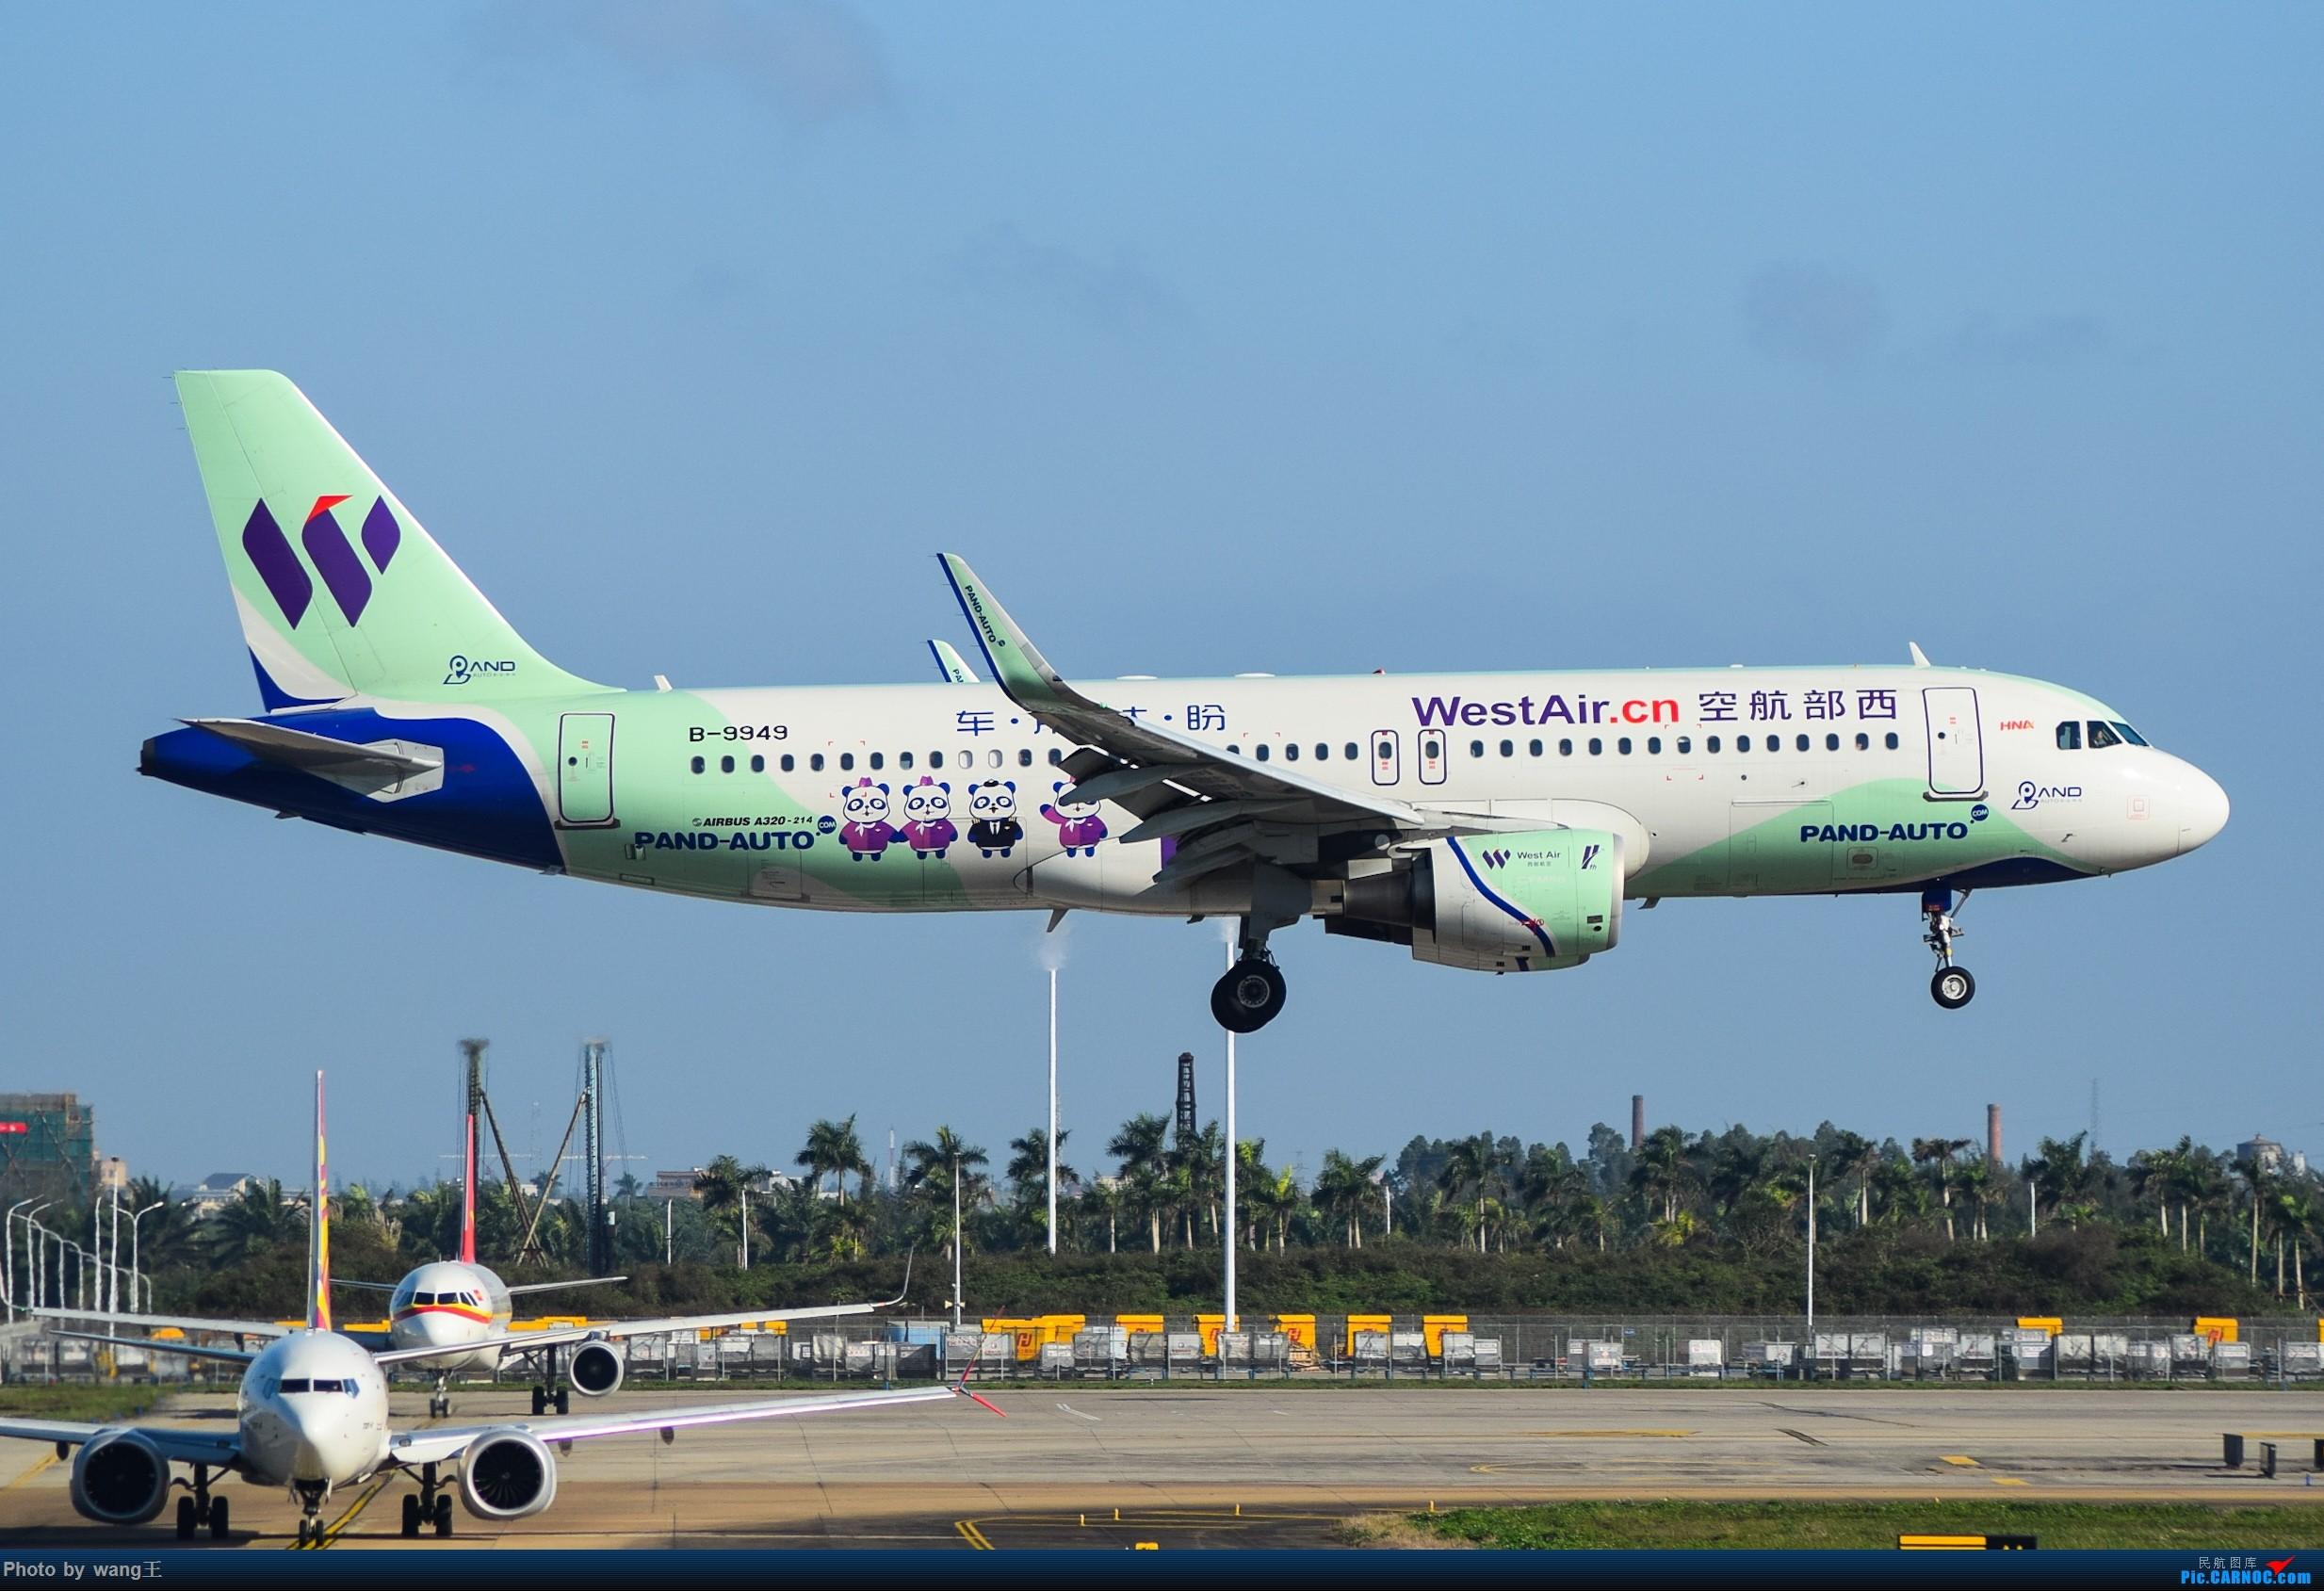 Re:[原创]记录HAK 2019的春运 AIRBUS A320-200 B-9949 中国海口美兰国际机场